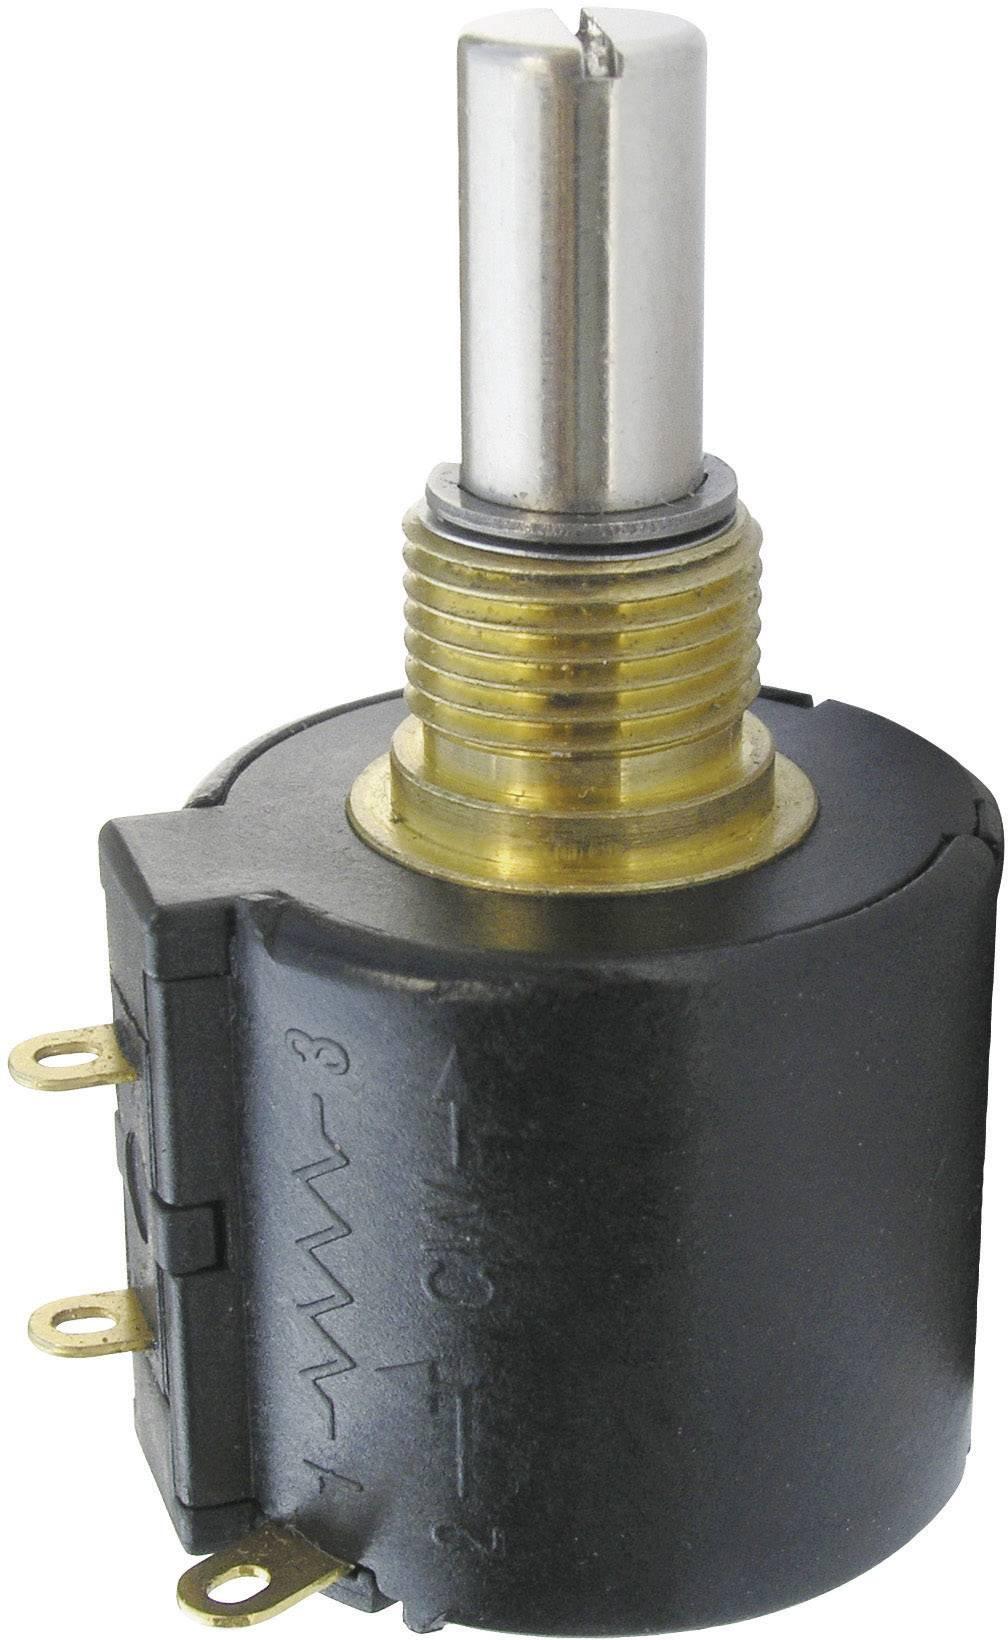 Presný potenciometer Wirewound, 10-cestný mono Bourns 3549S-1AA-502A 3549S-1AA-502A, 2 W, 5 kOhm, 1 ks